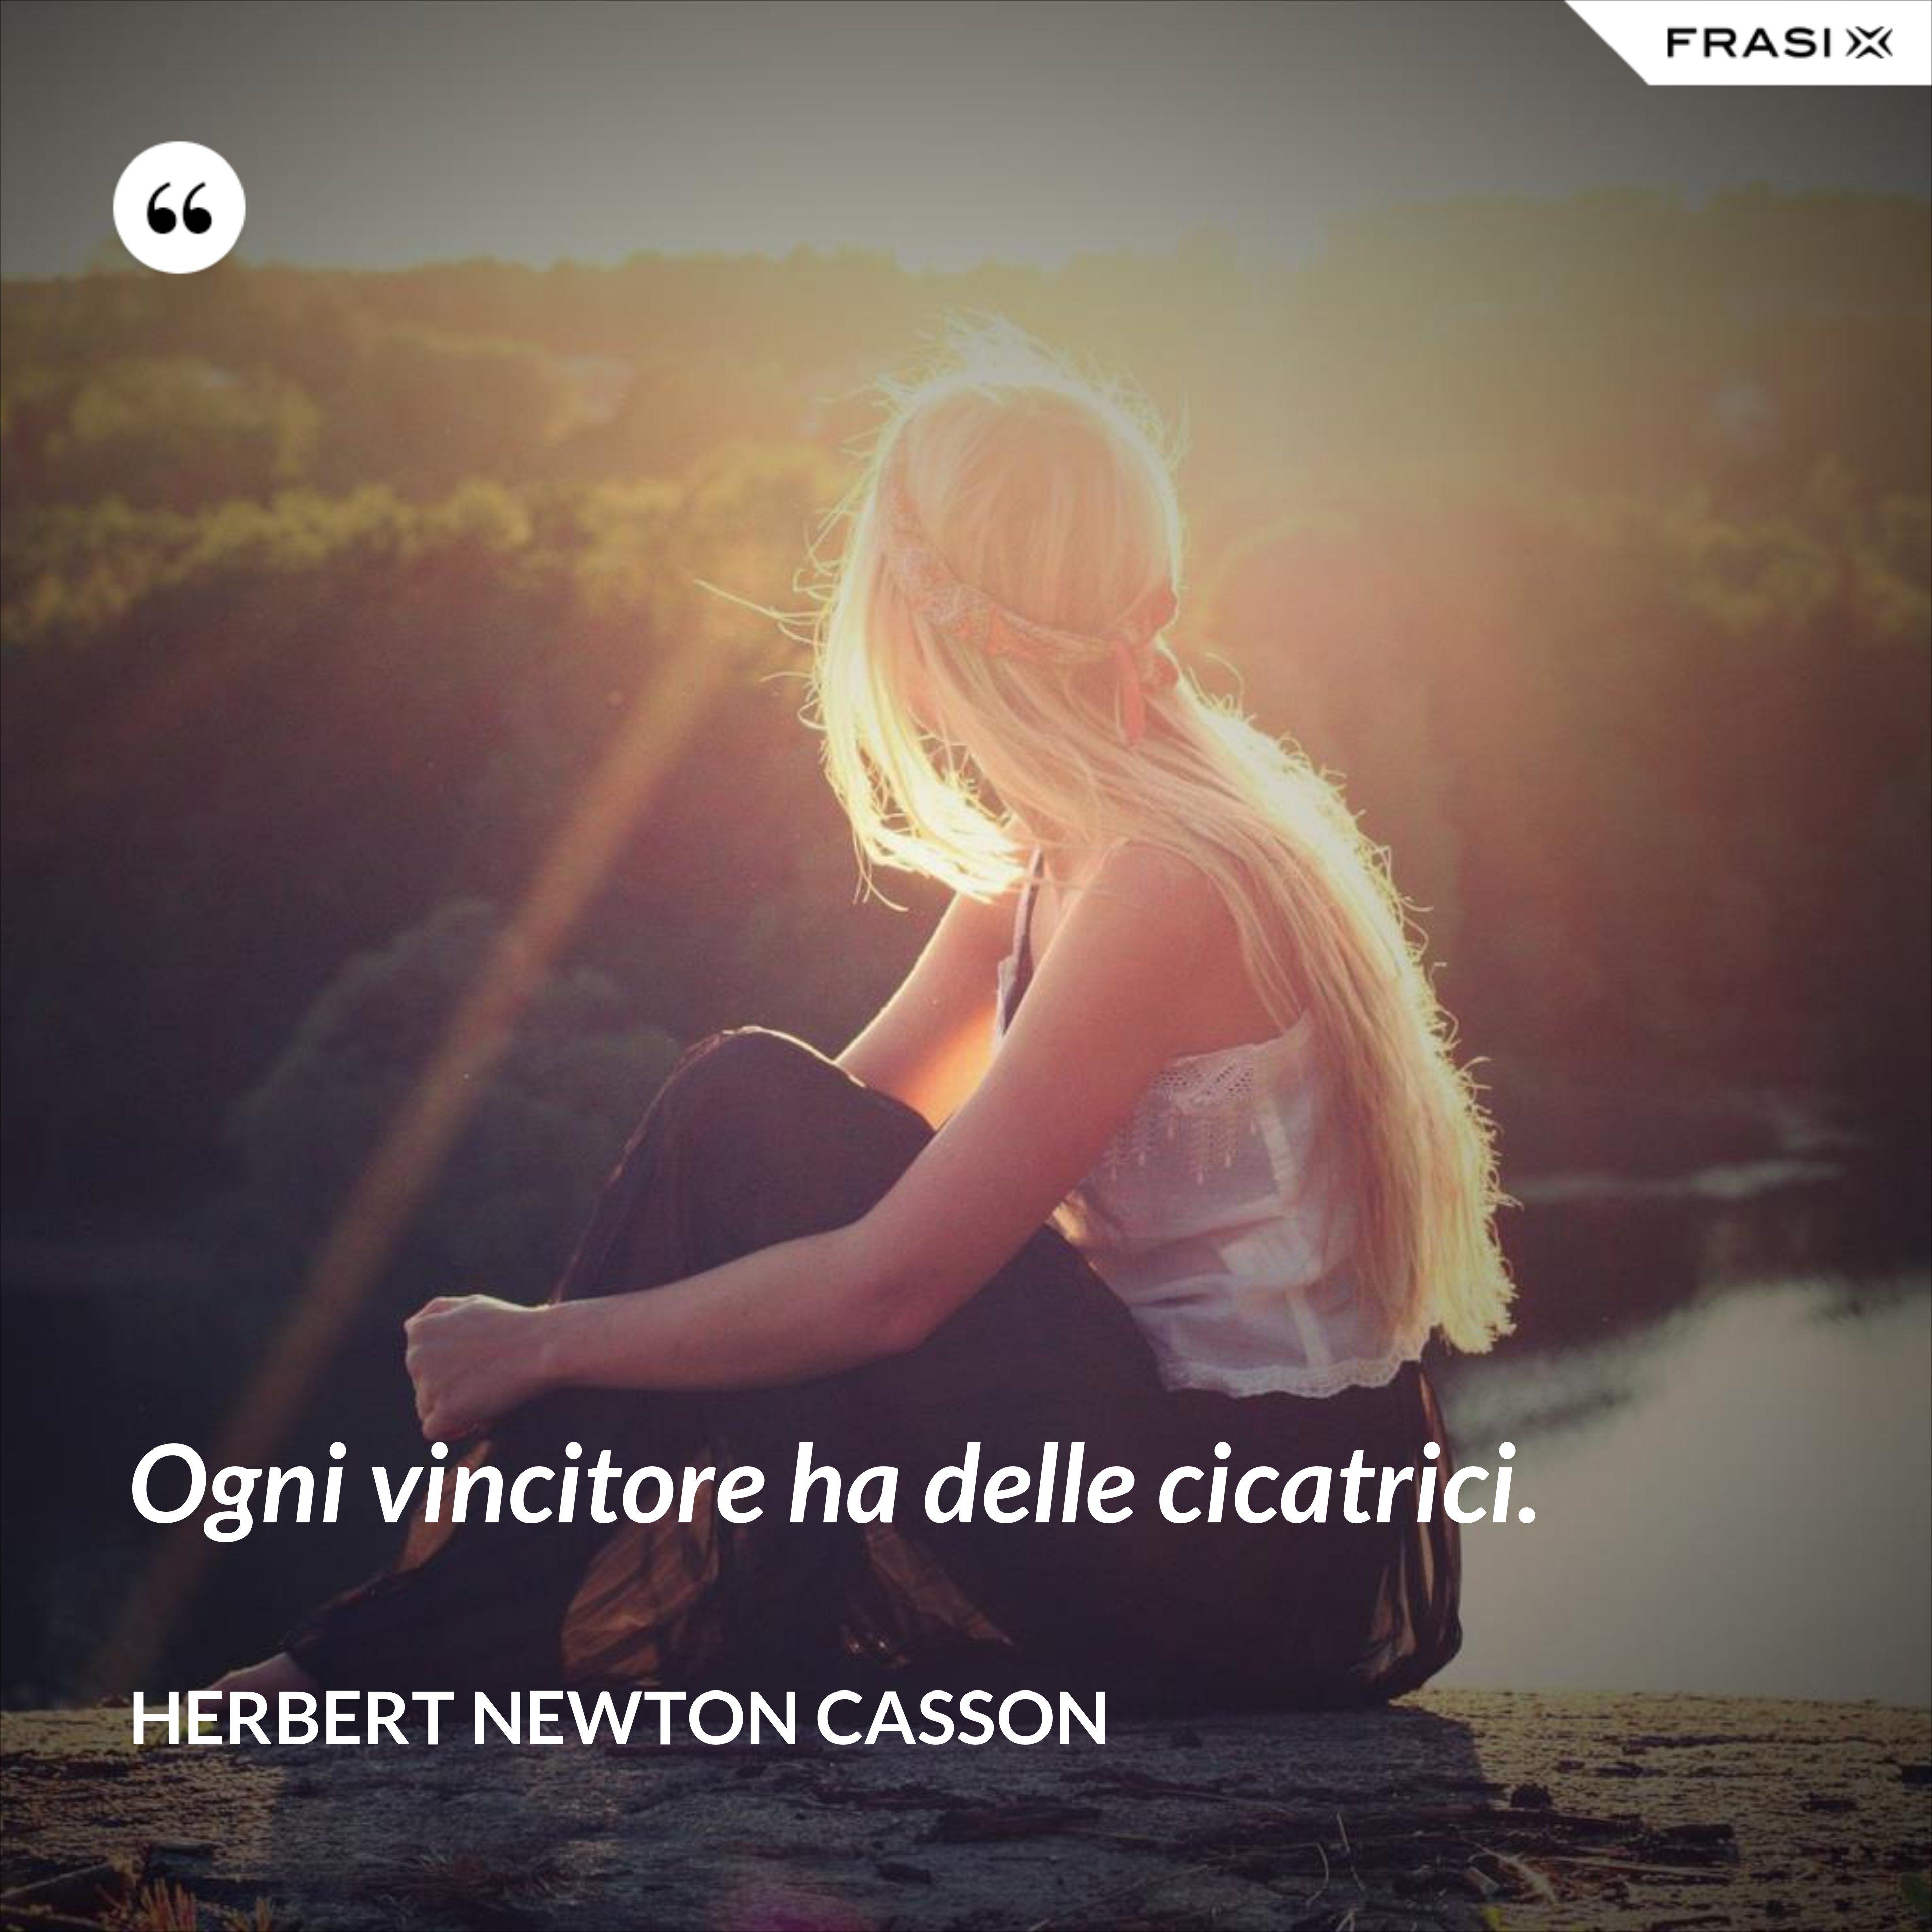 Ogni vincitore ha delle cicatrici. - Herbert Newton Casson